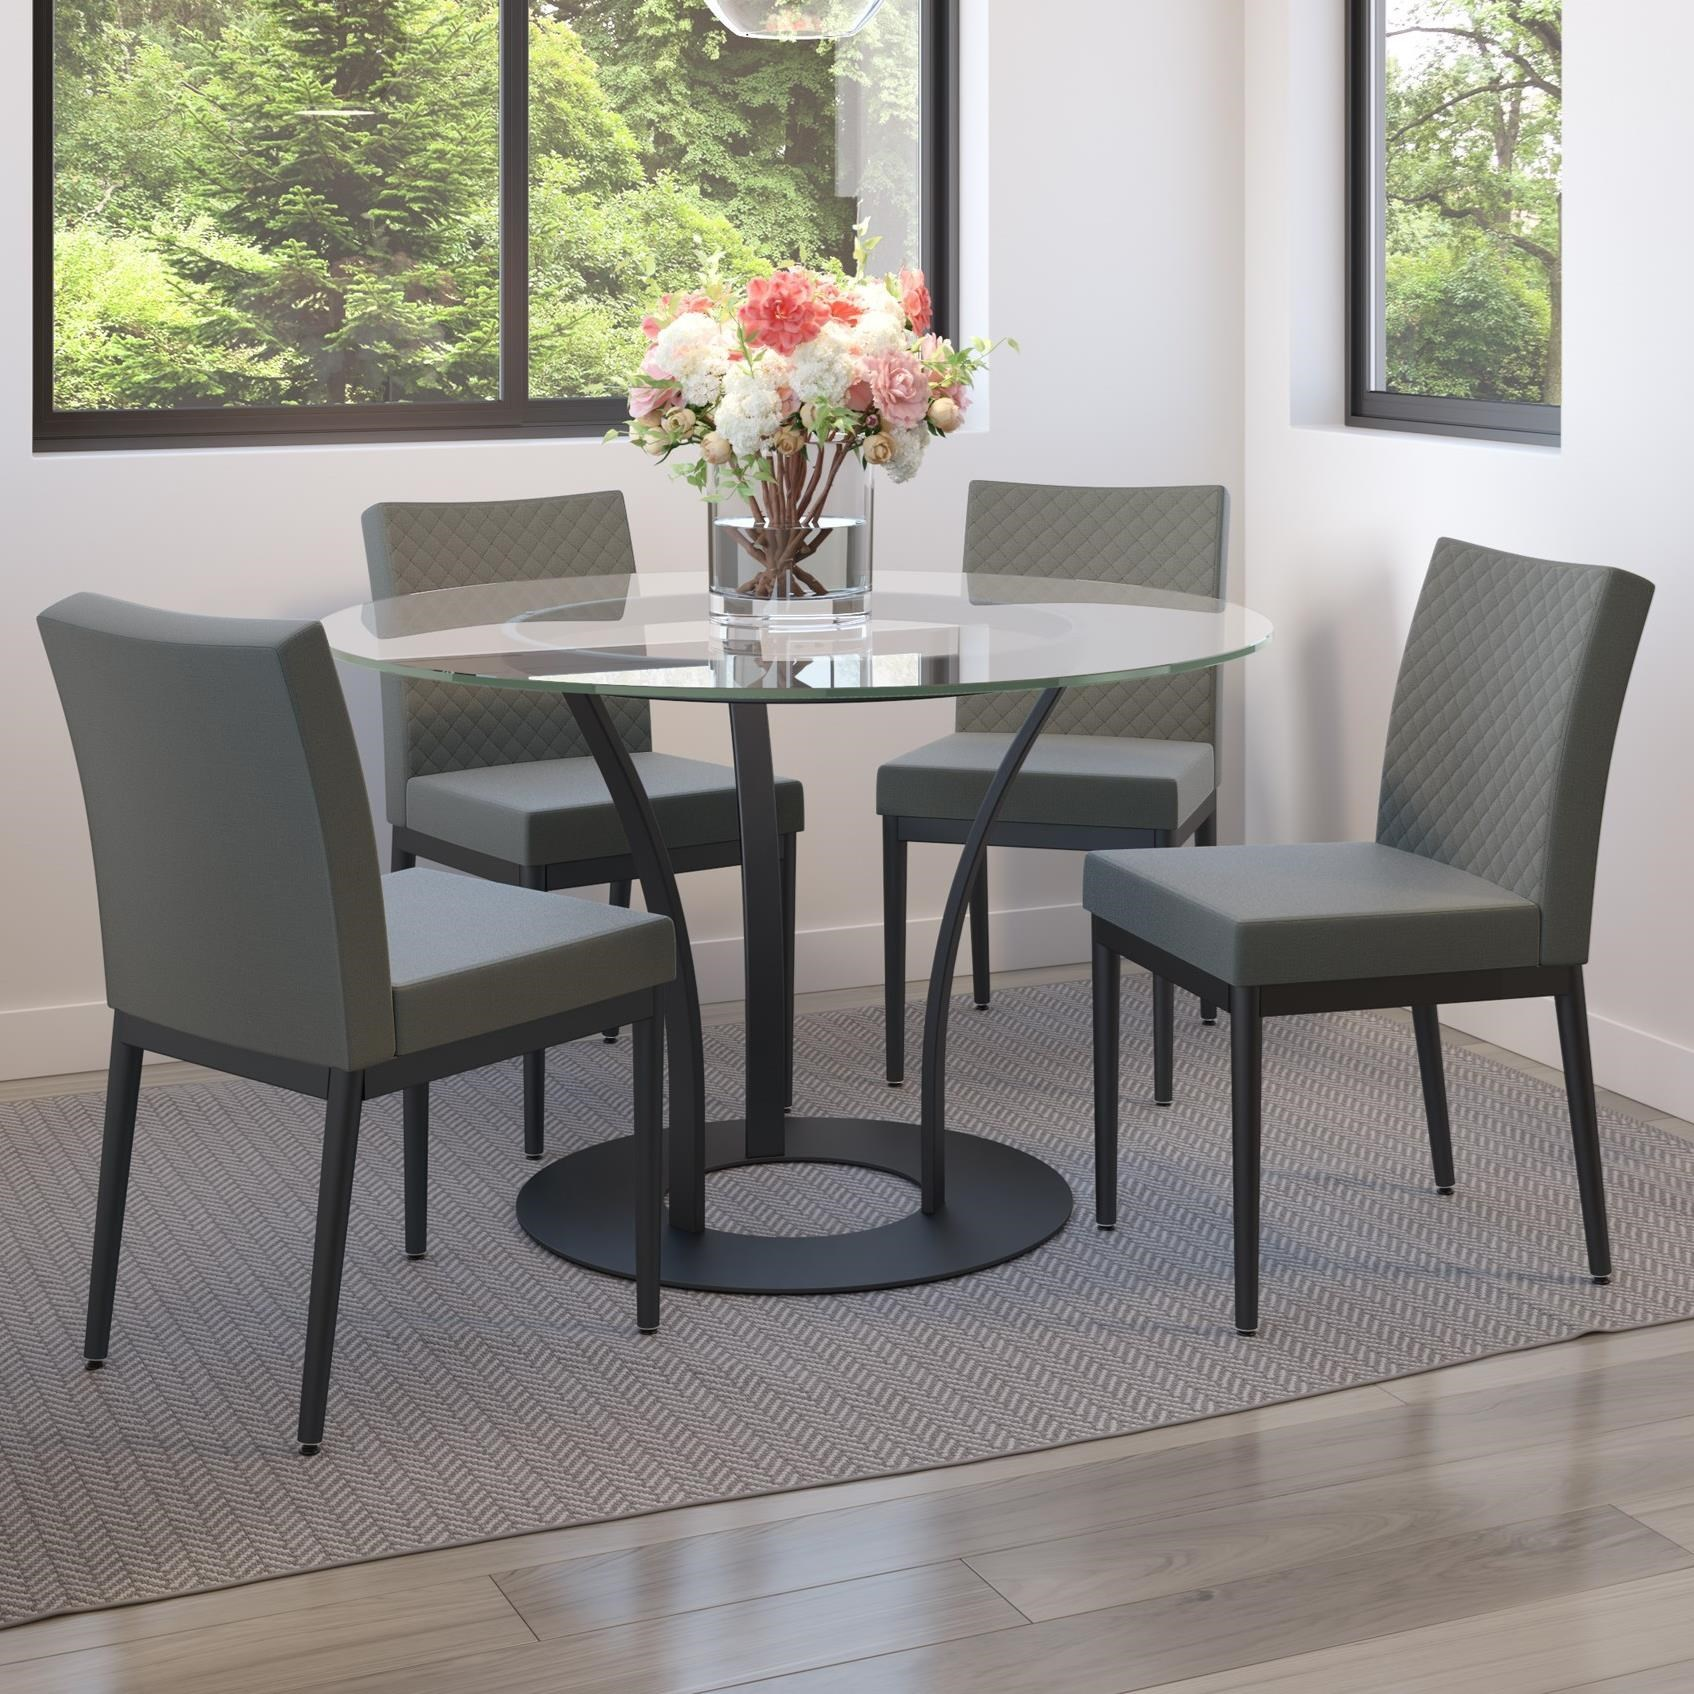 Urban 5-Piece Dalia XL Table Set by Amisco at Jordan's Home Furnishings